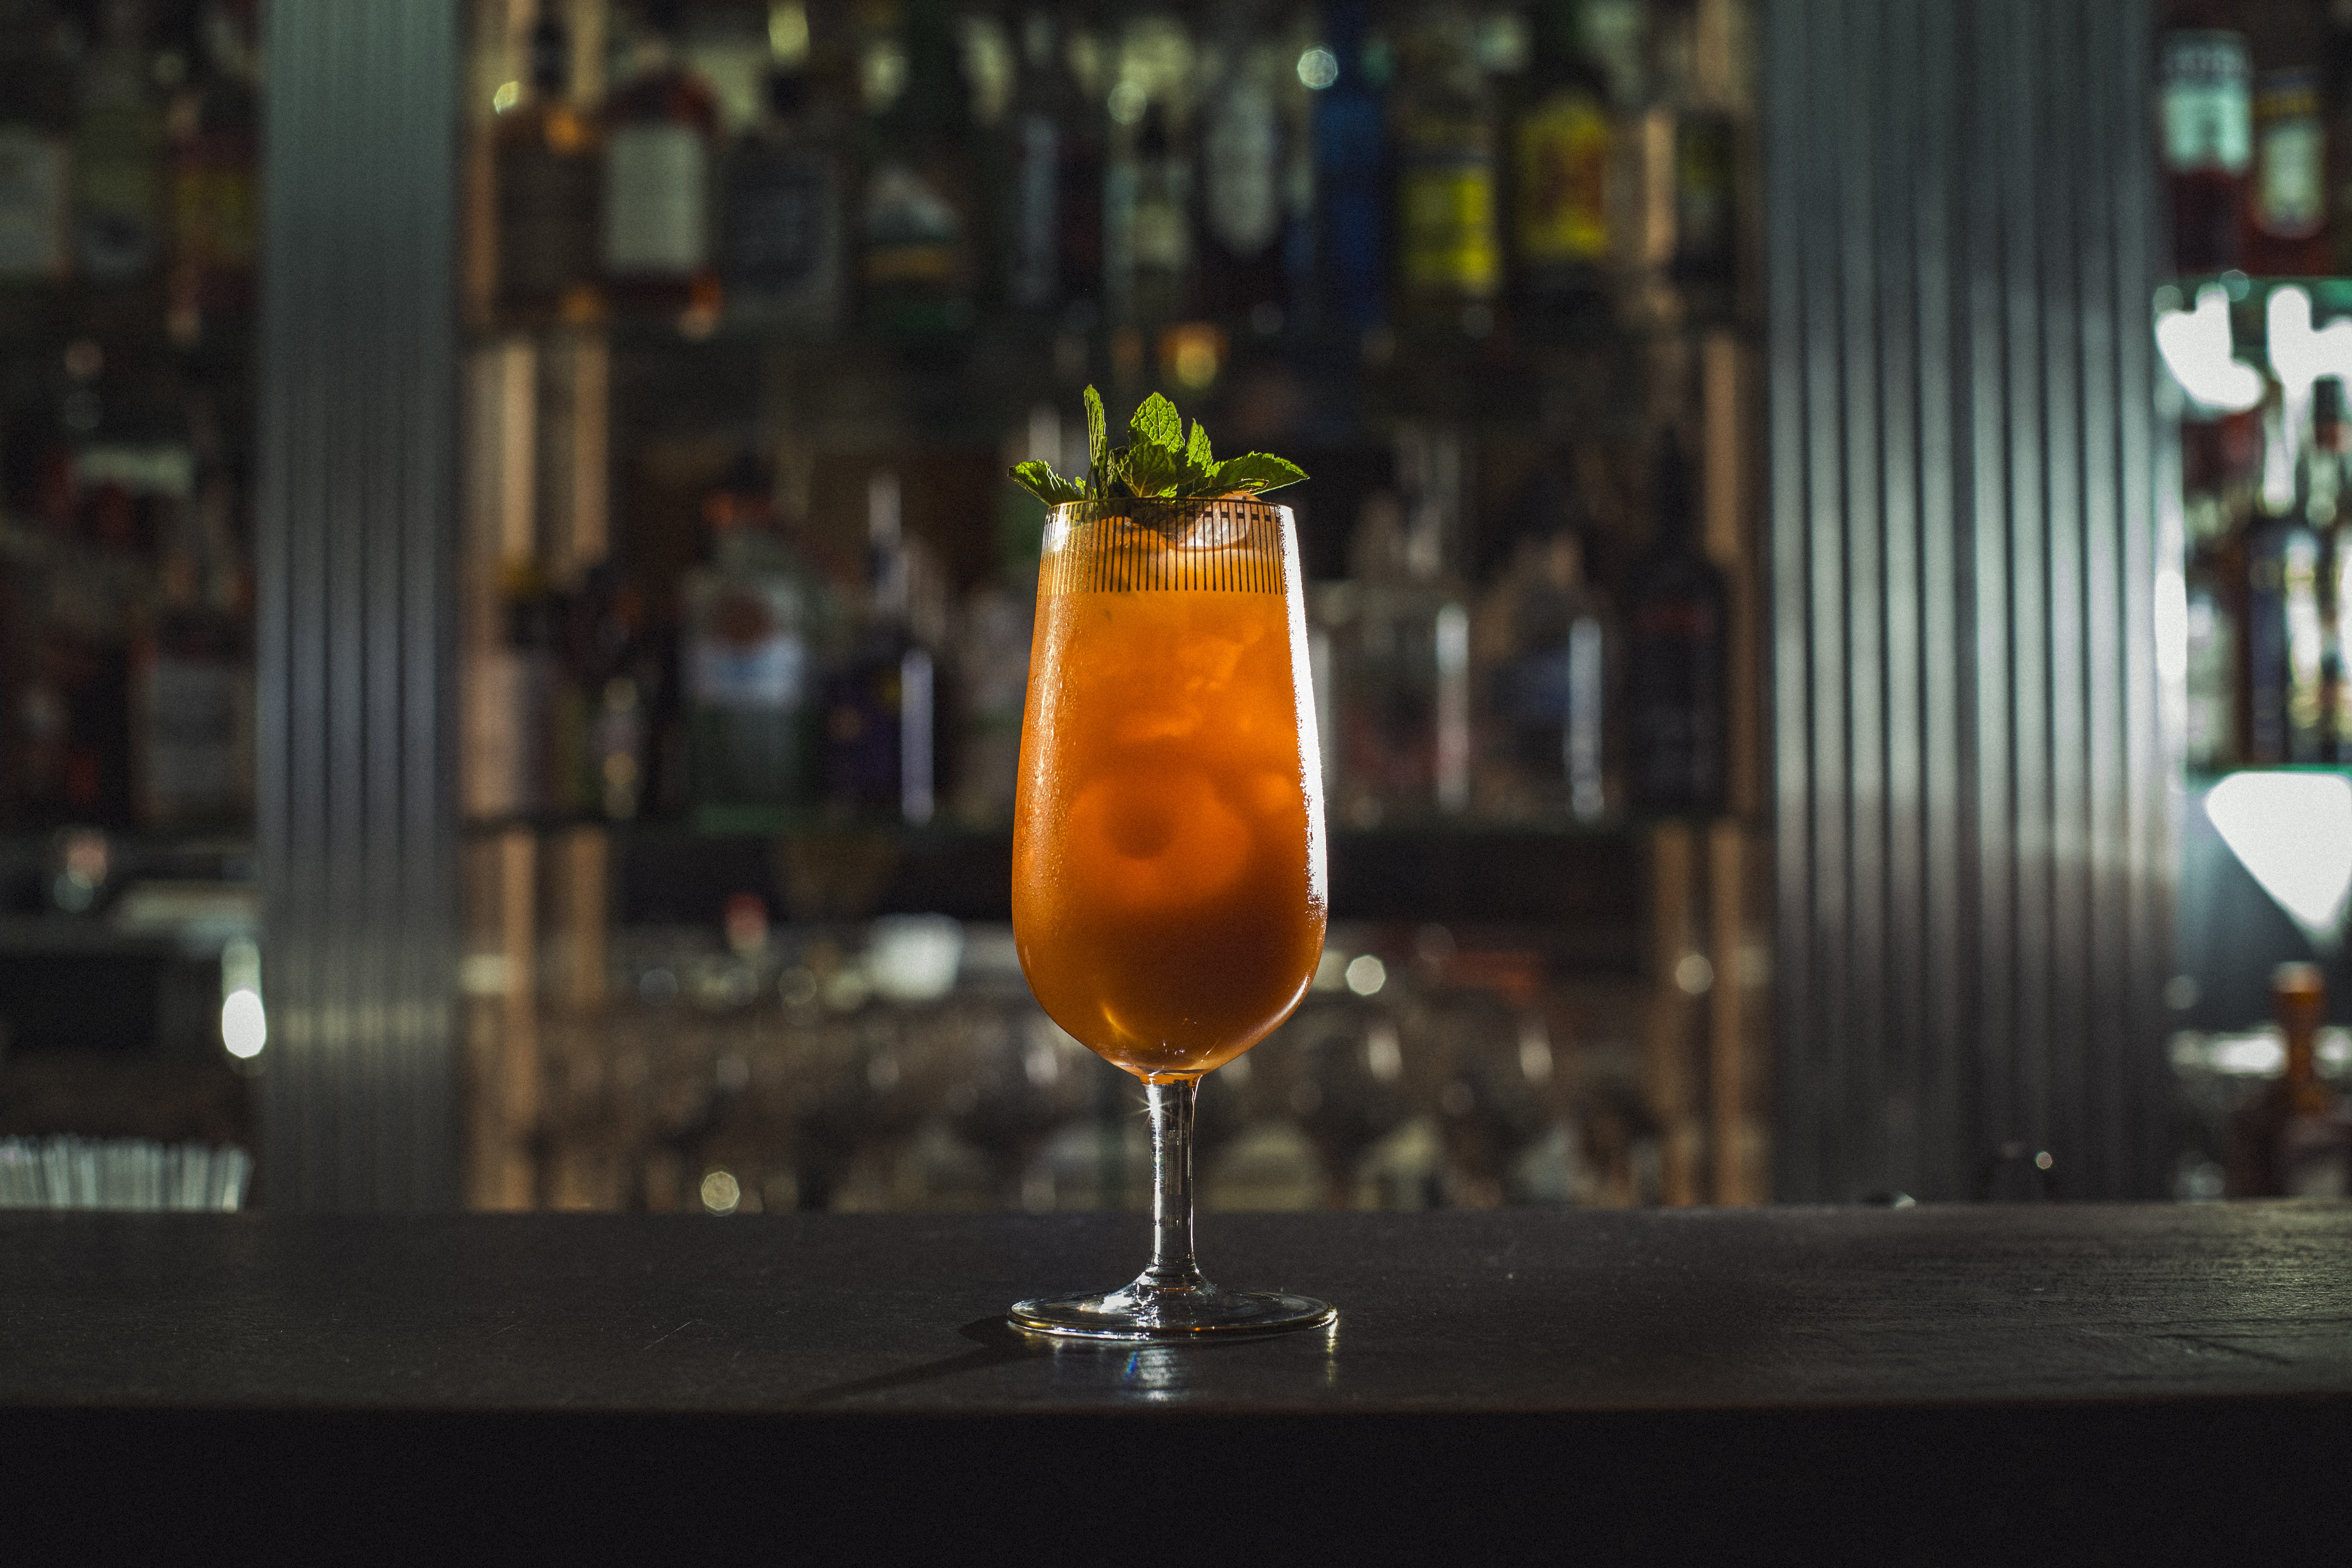 restaurant-bar-plata-cocktailbar-aarhus-midtbyen-6879